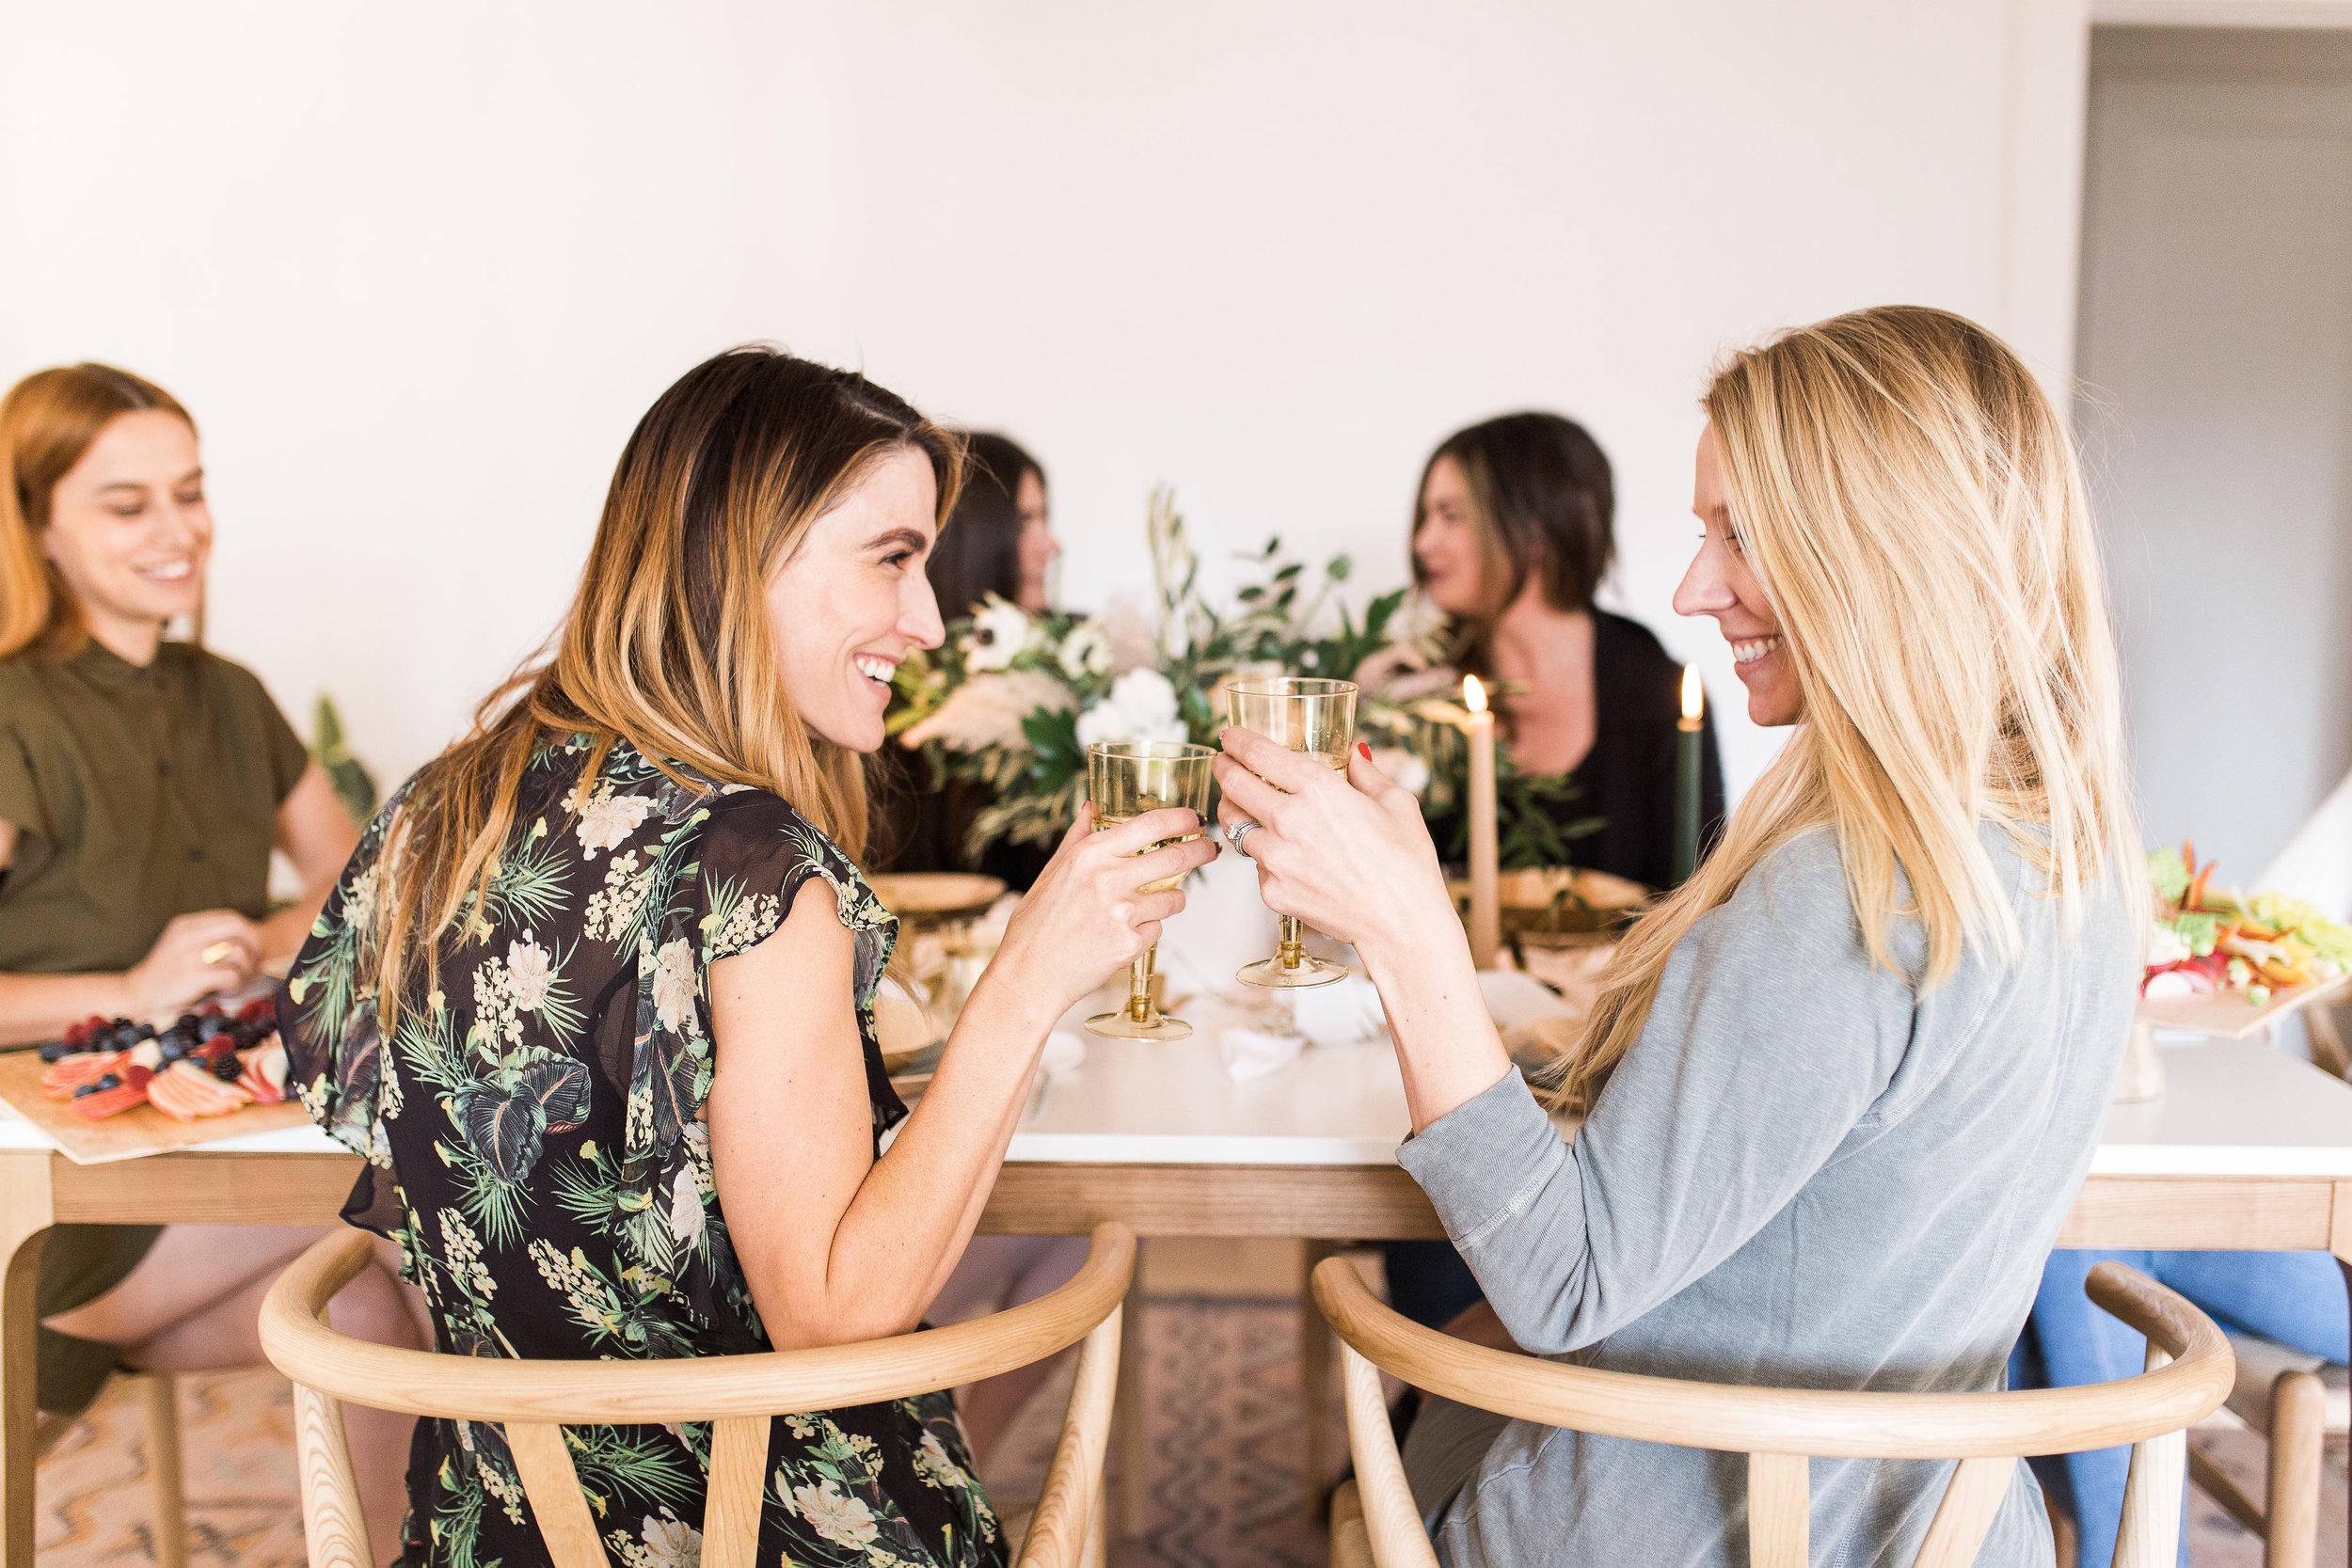 indoor girlfriends brunch ideas from livingforaged.com